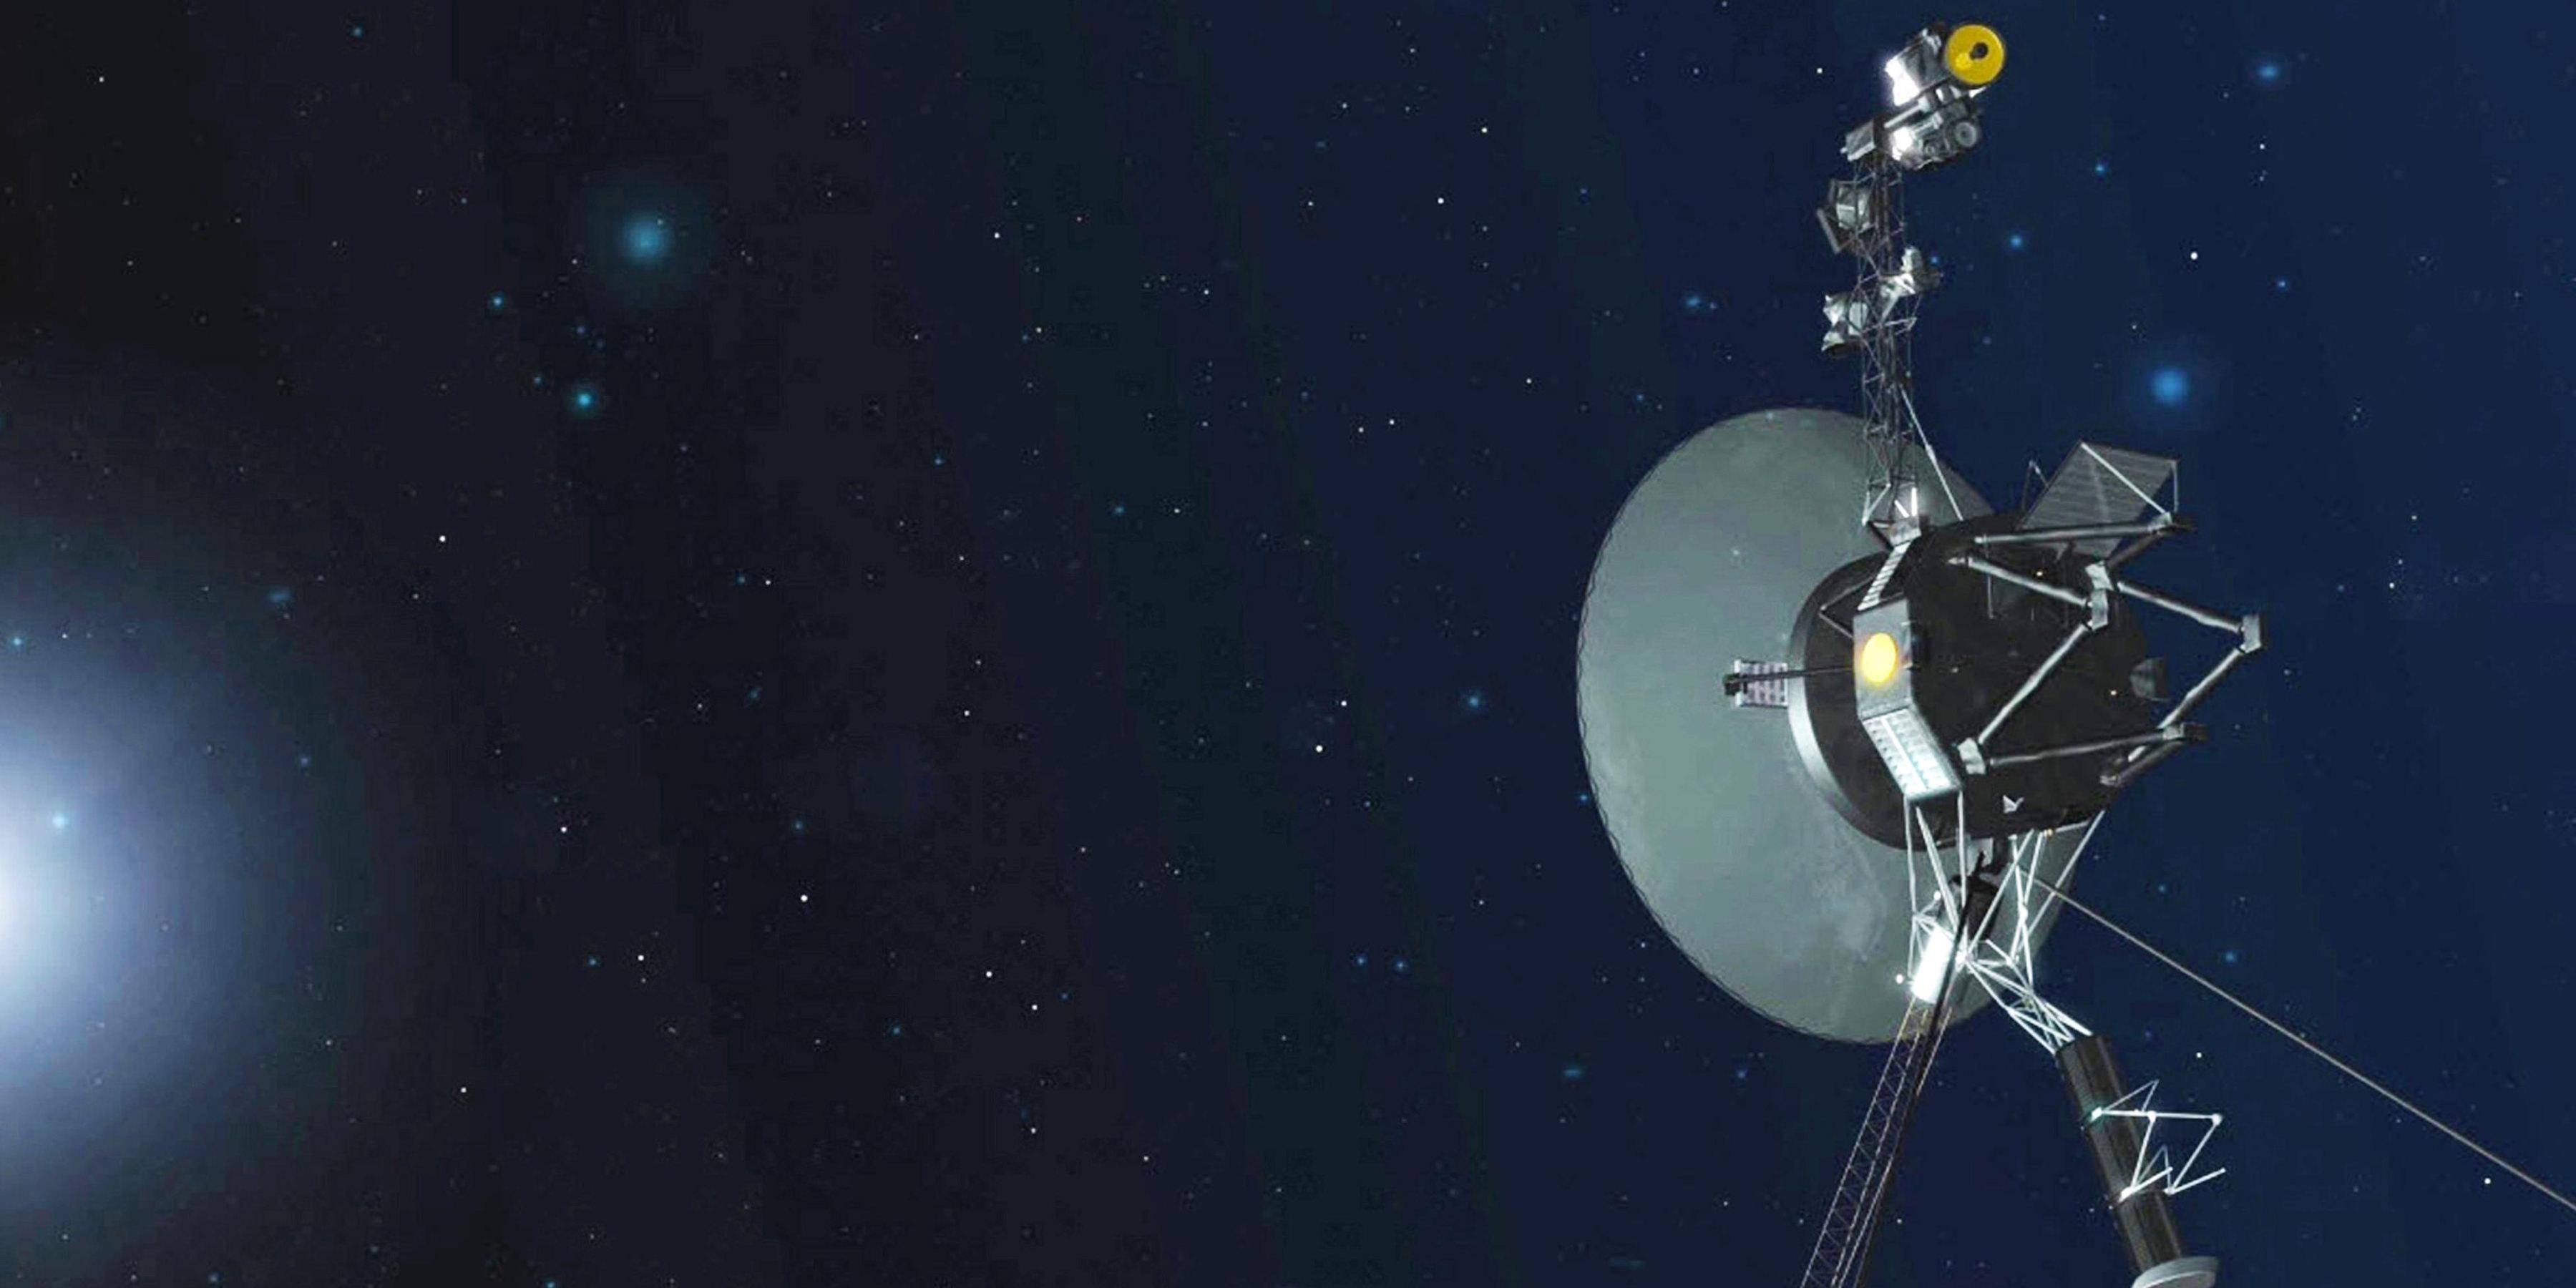 A Voyager Probe